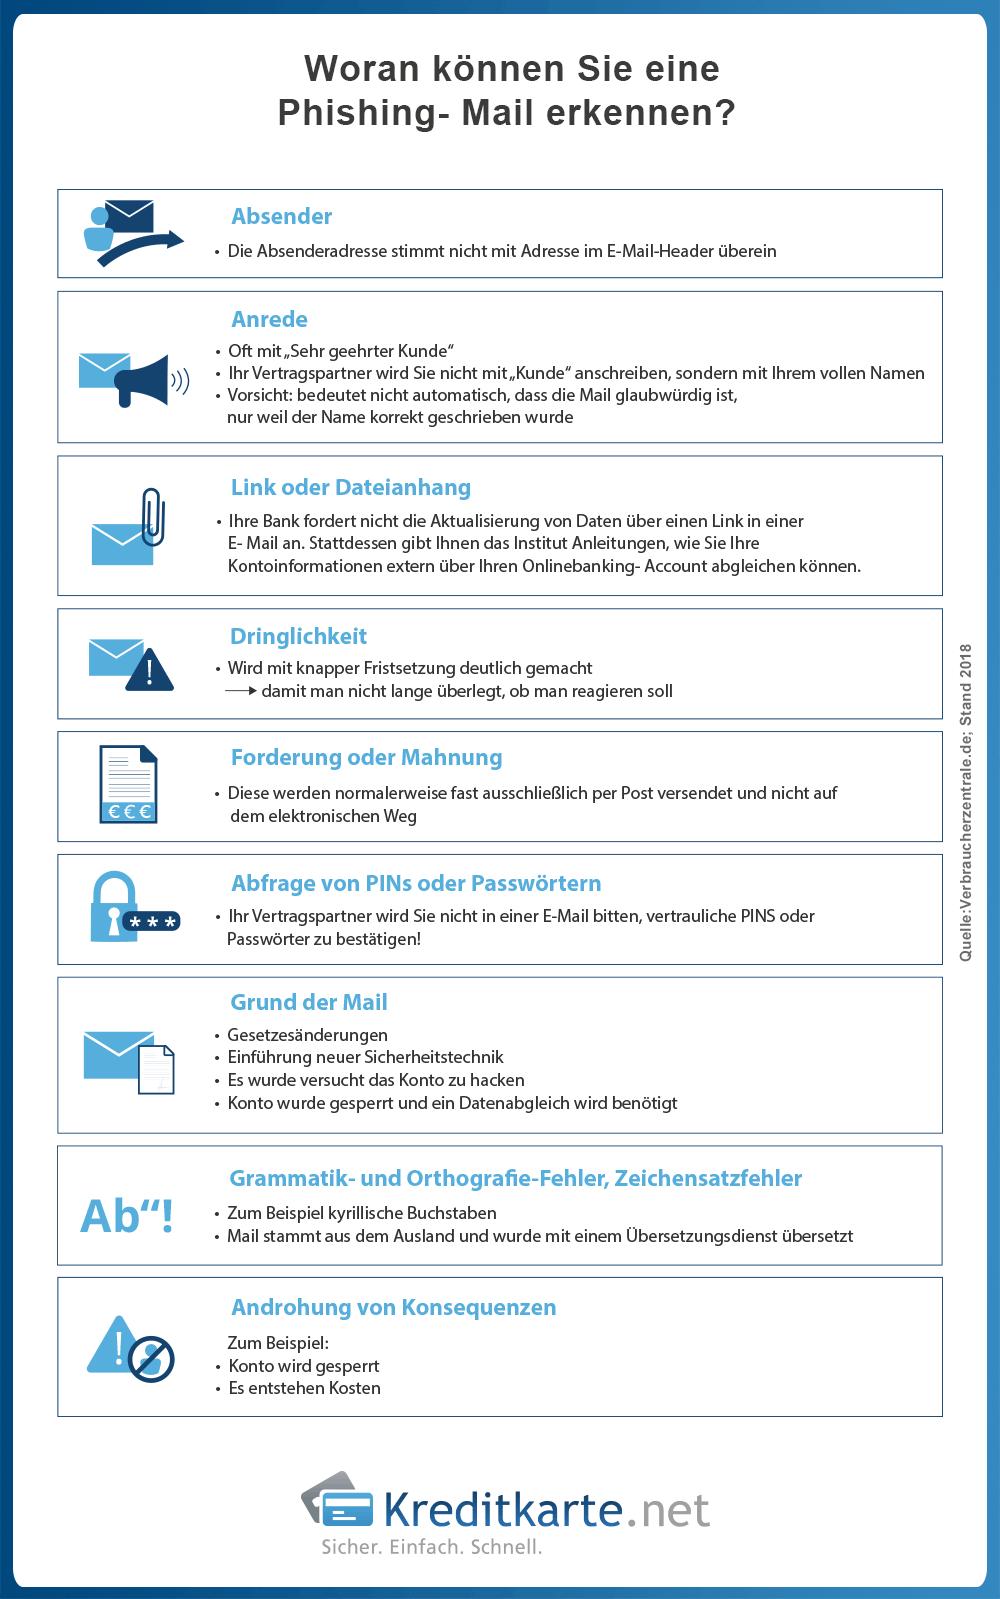 infografik-aufbau-phishing-mail